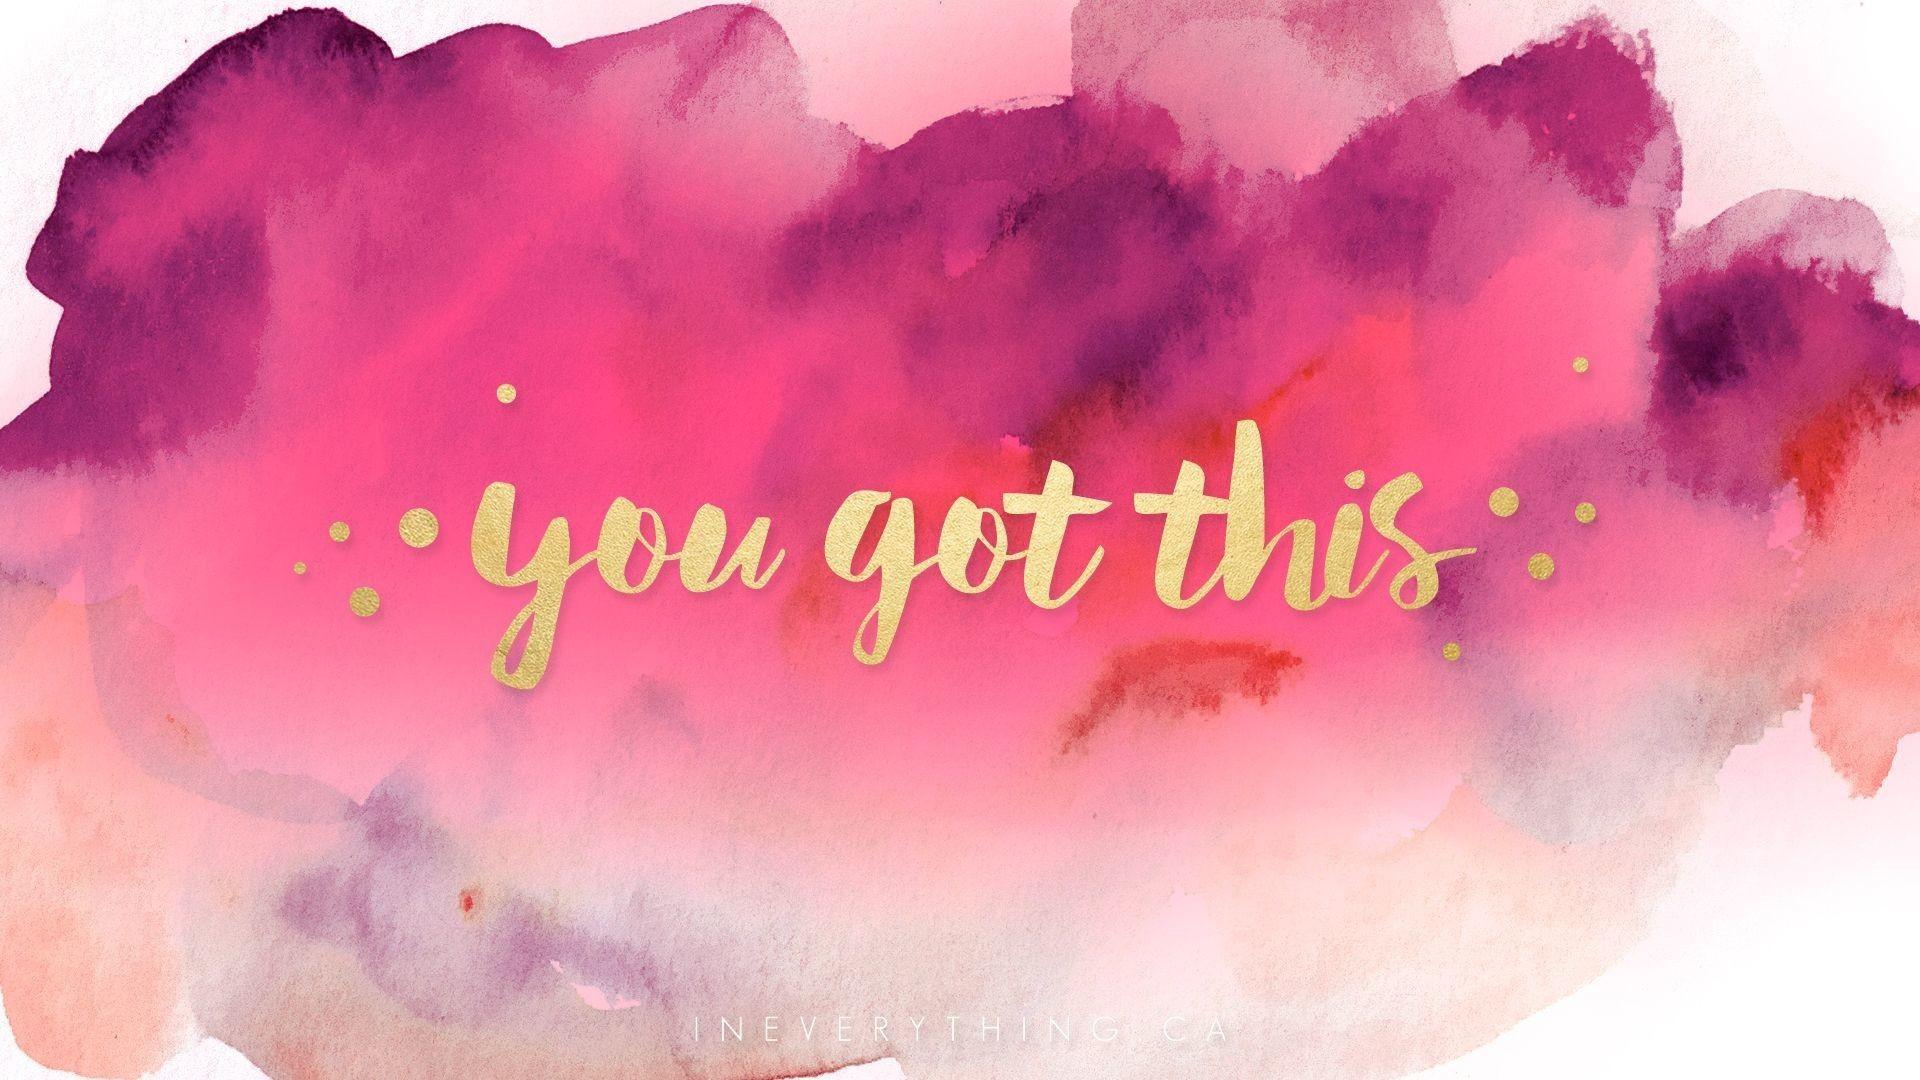 Girly Inspirational Desktop Wallpaper (61+ images)